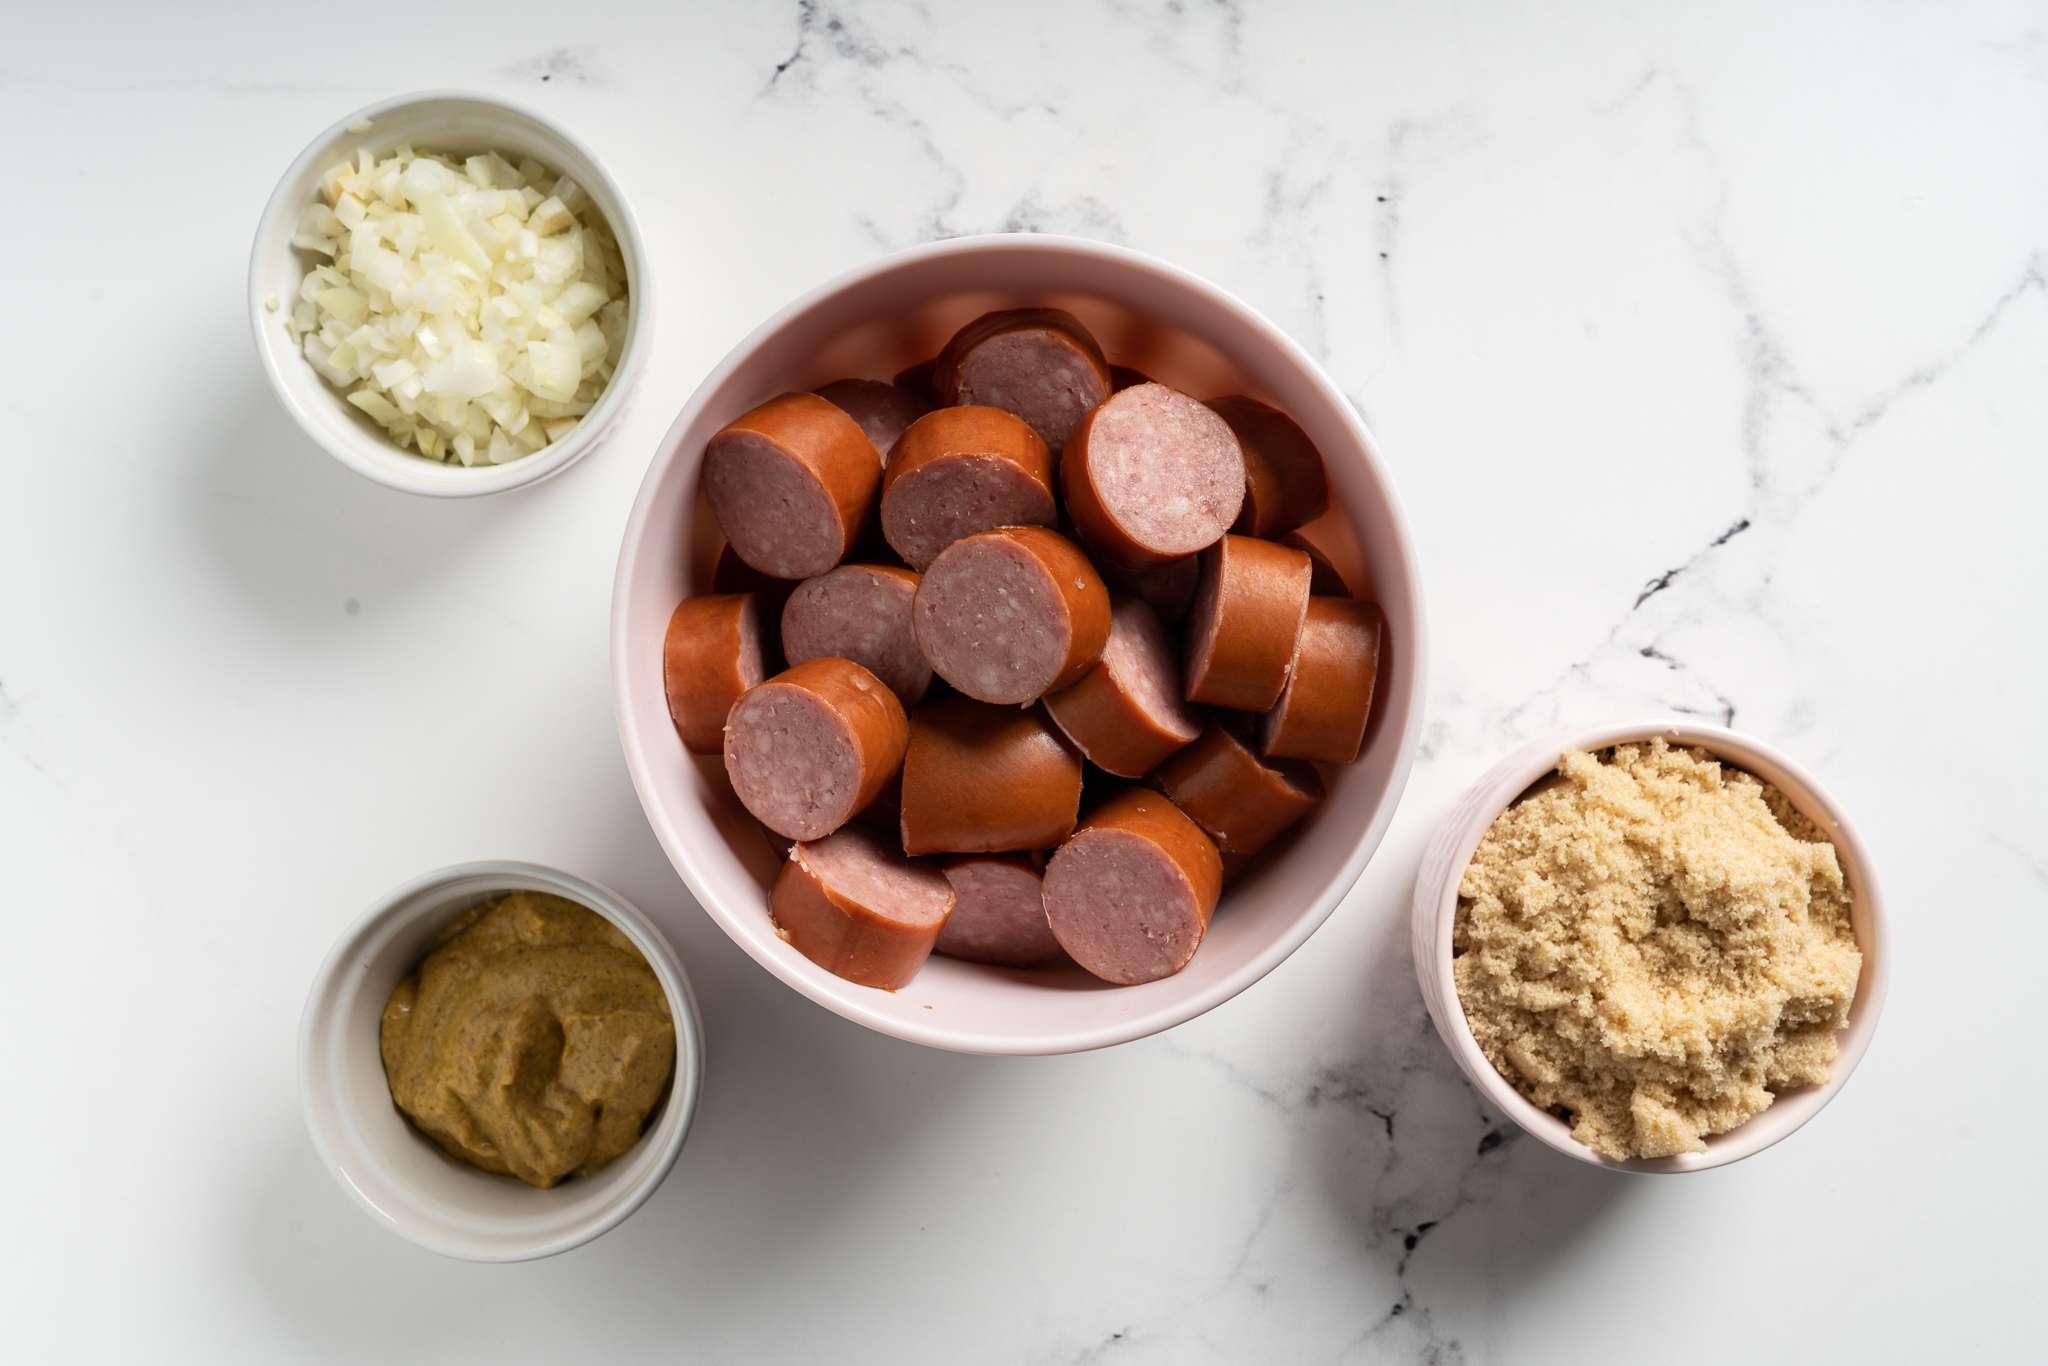 Sweet and Spicy Crock Pot Kielbasa ingredients